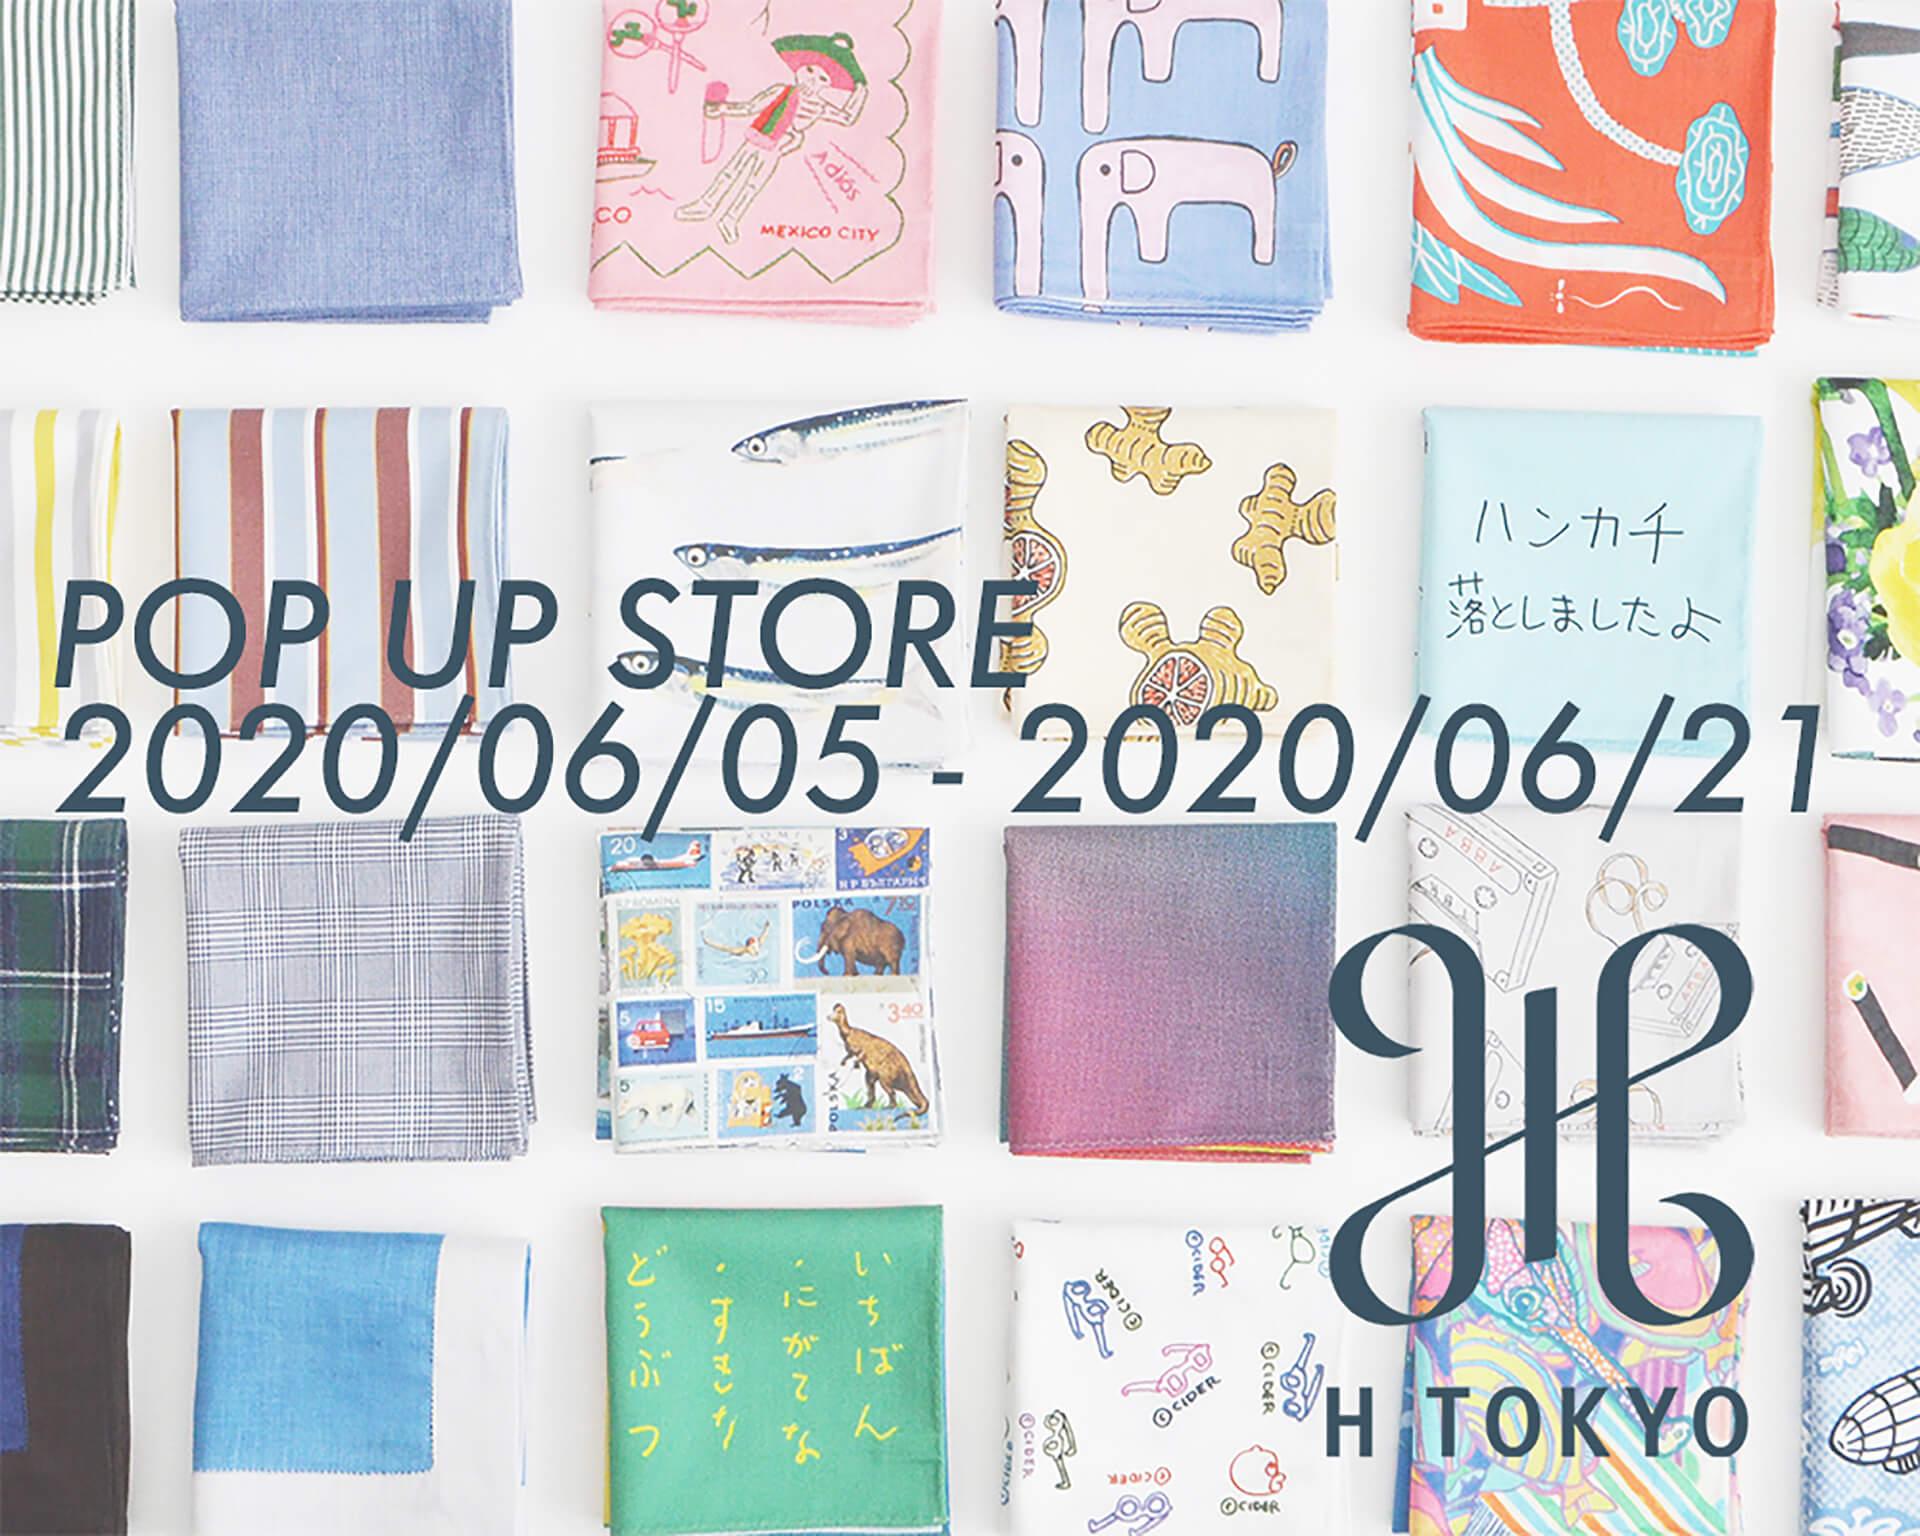 「H TOKYO」のPOP UP STORE